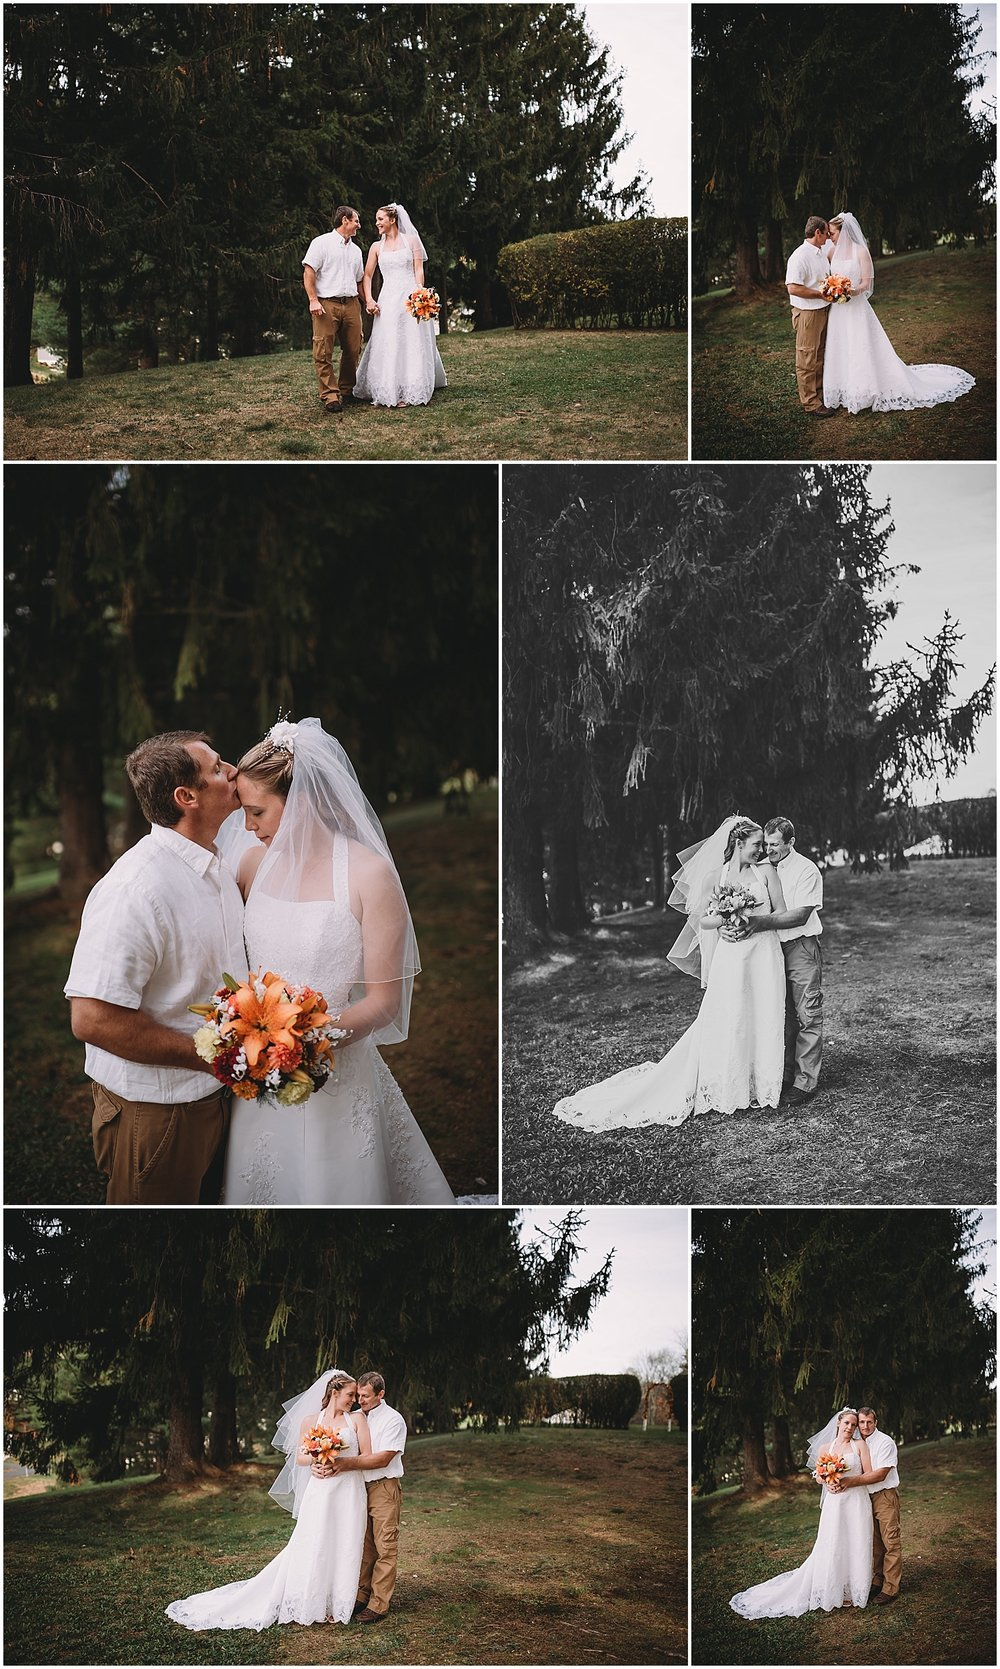 NEPA-Scranton-Dallas-wedding-engagement-photographer-in-Philadelphia-PA-Central-PA_0093.jpg